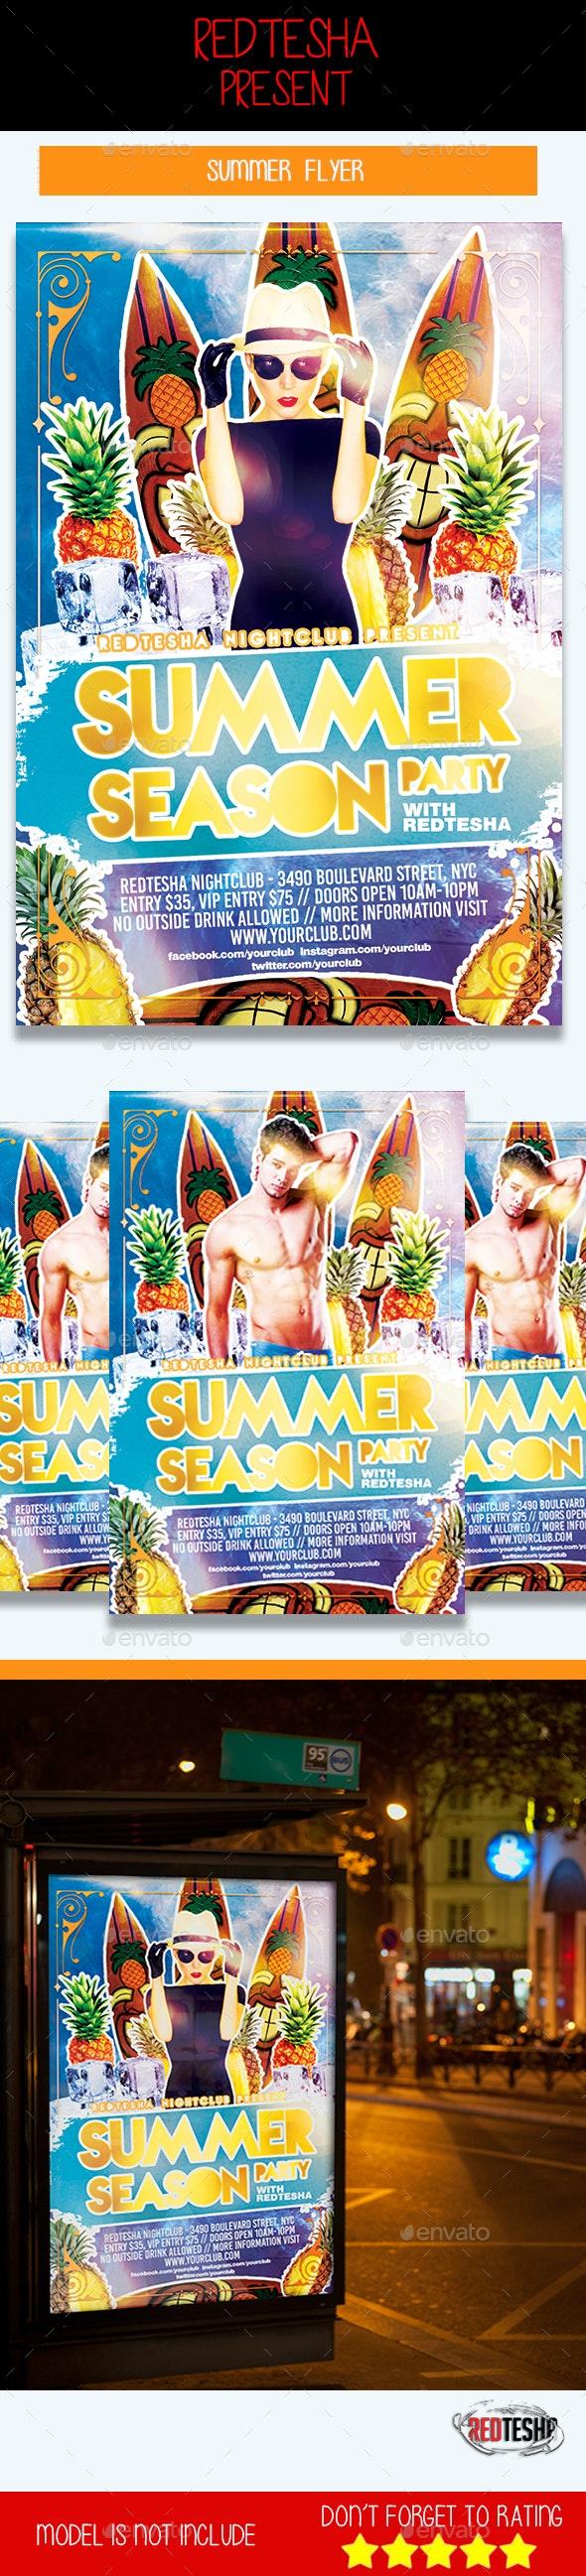 Summer Season Flyer - Clubs & Parties Events